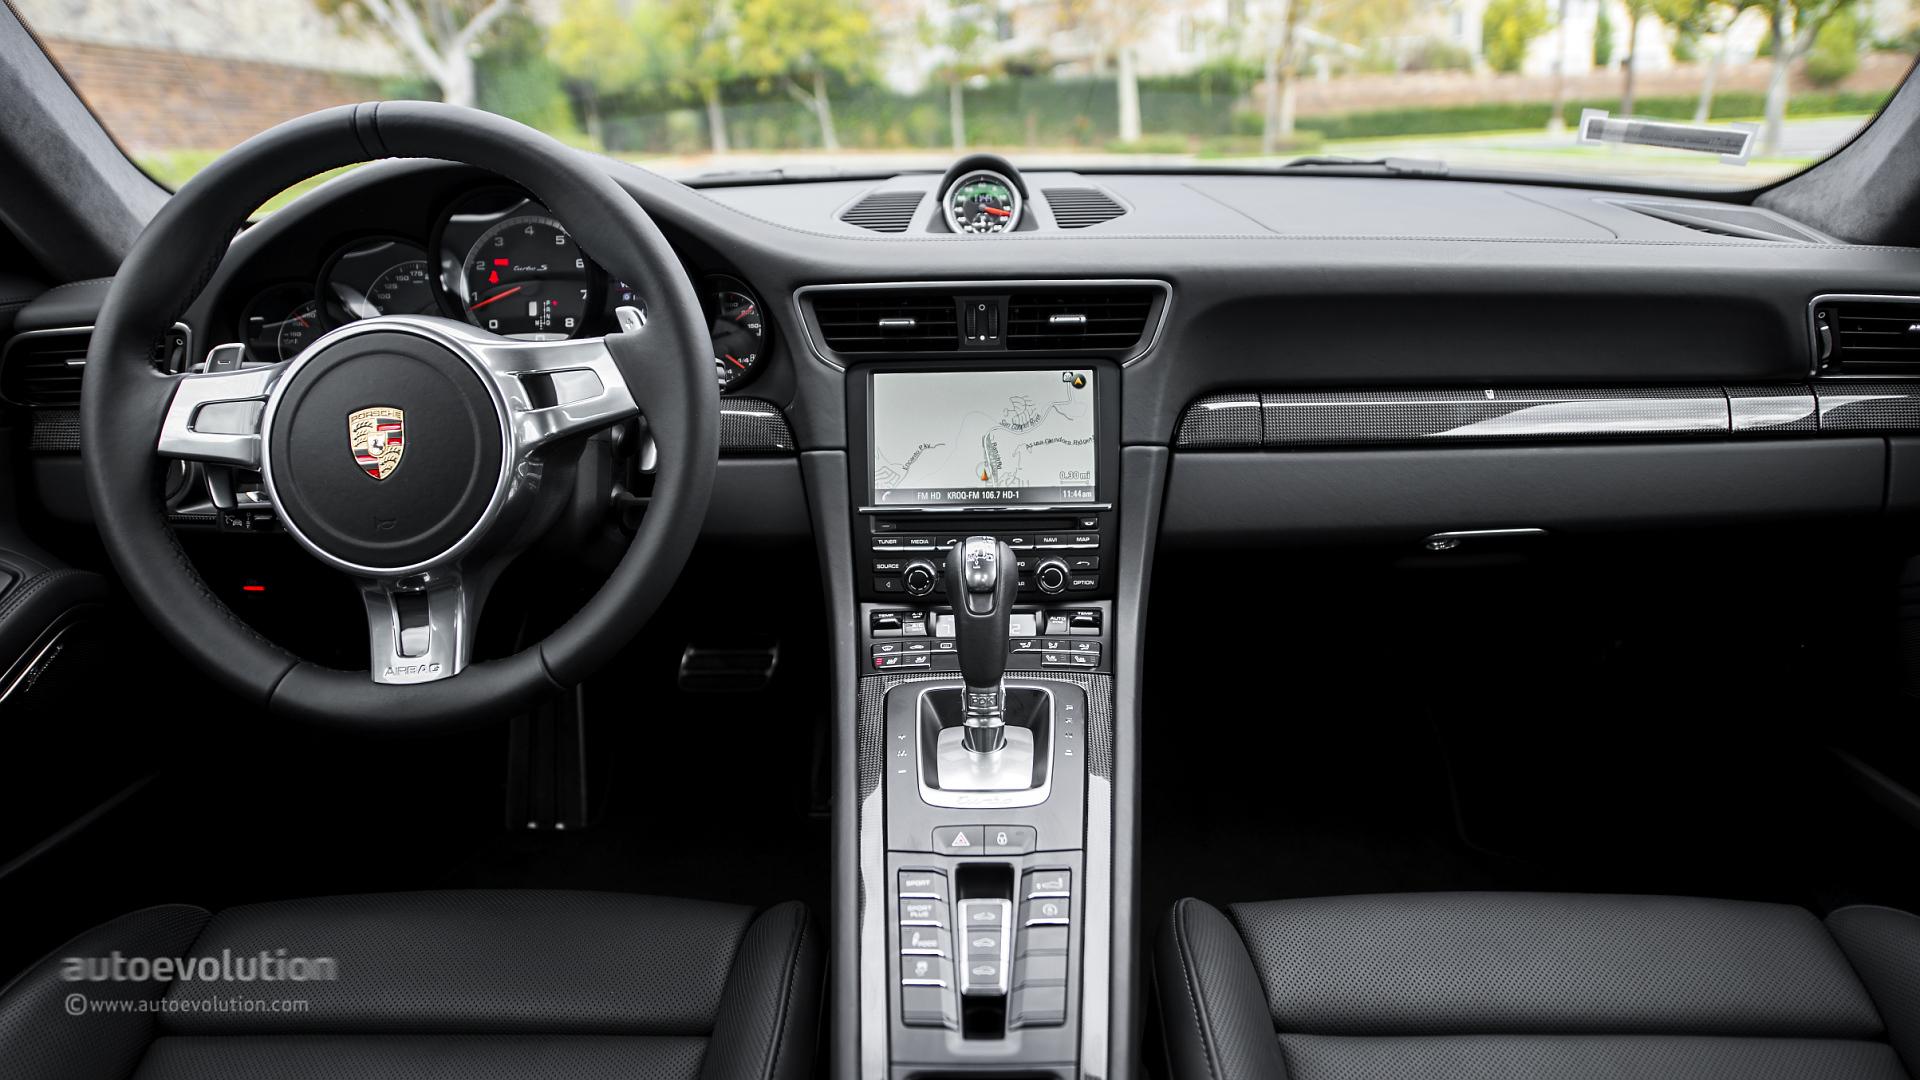 2014 Porsche 911 Turbo S Original Pictures Autoevolution